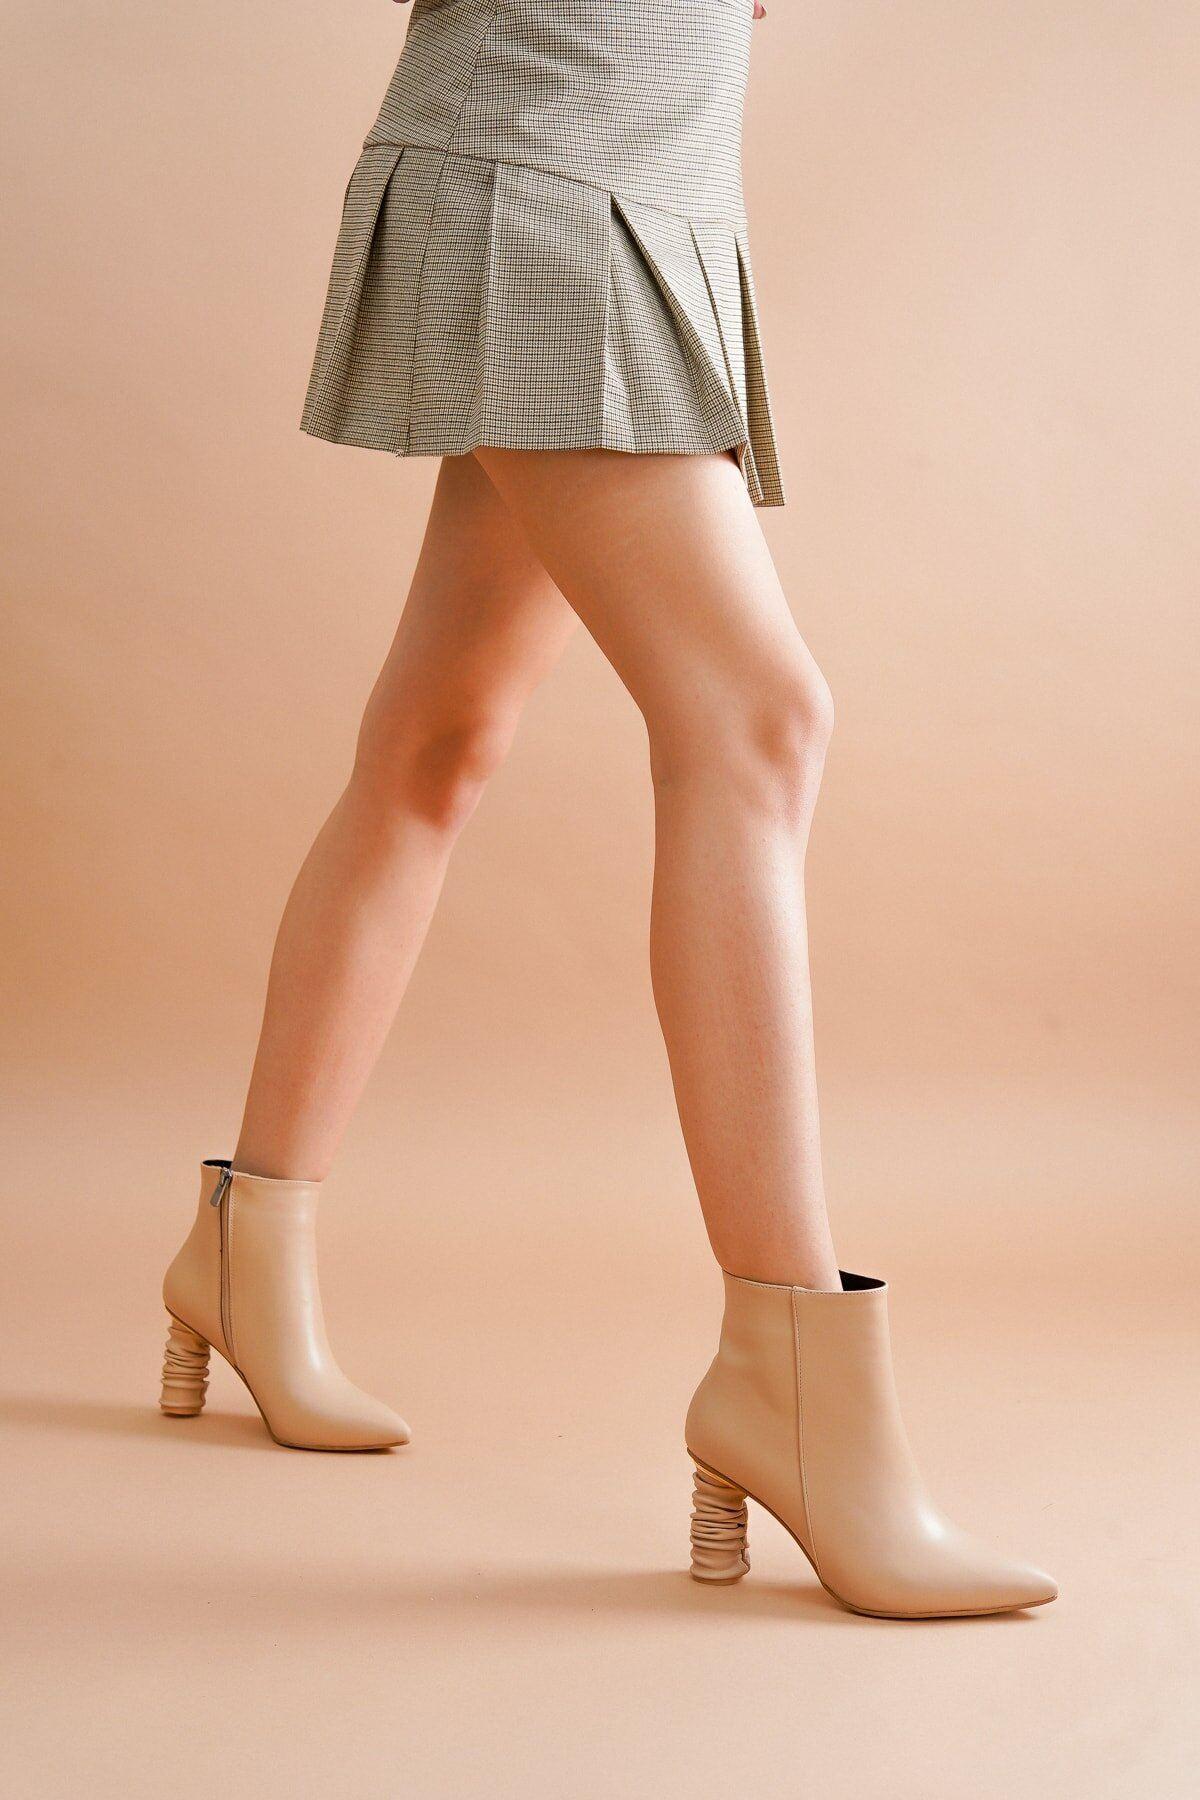 Adda Ten Cilt Topuklu Kadın Bot